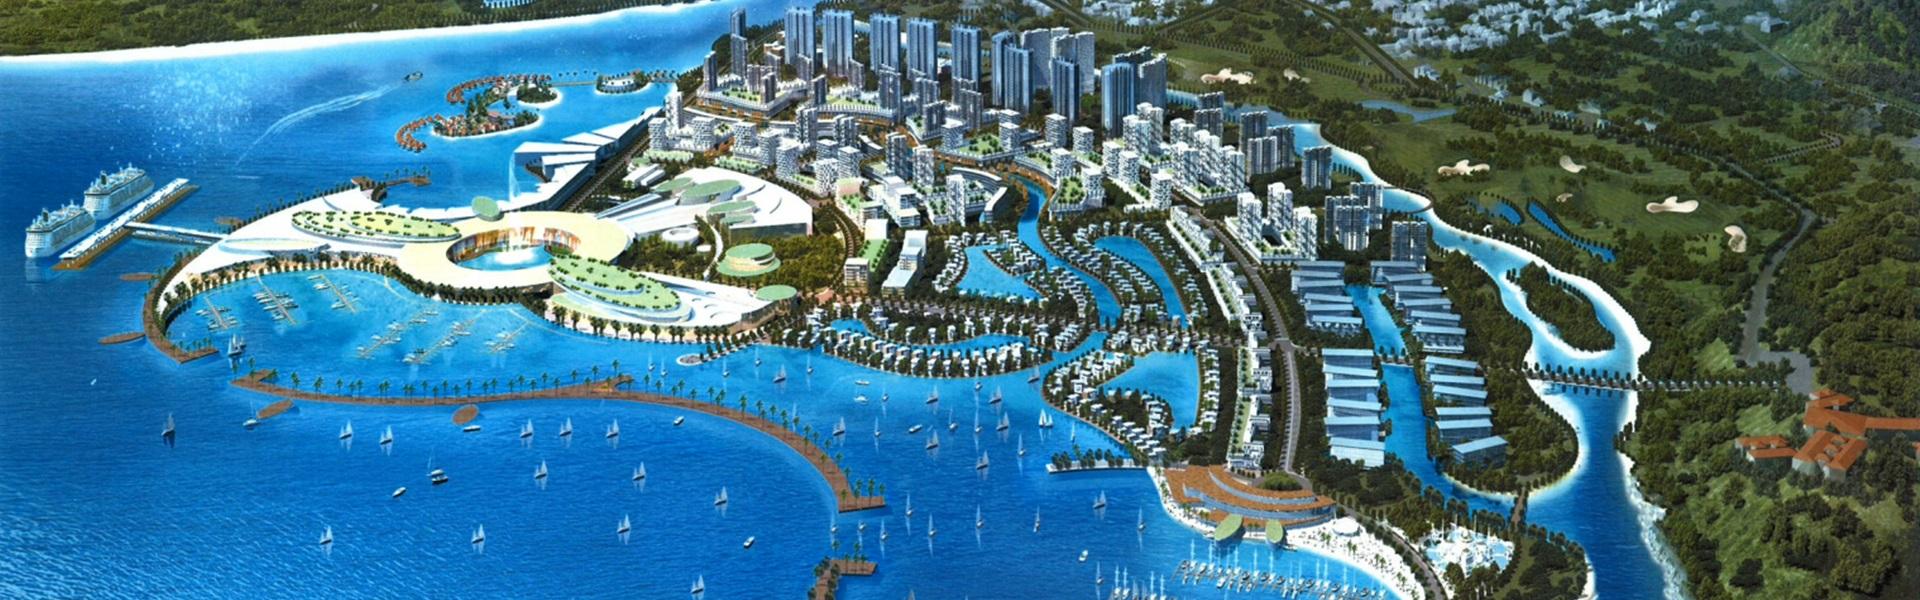 pasdec-property-development-kuantan-promenade-slider